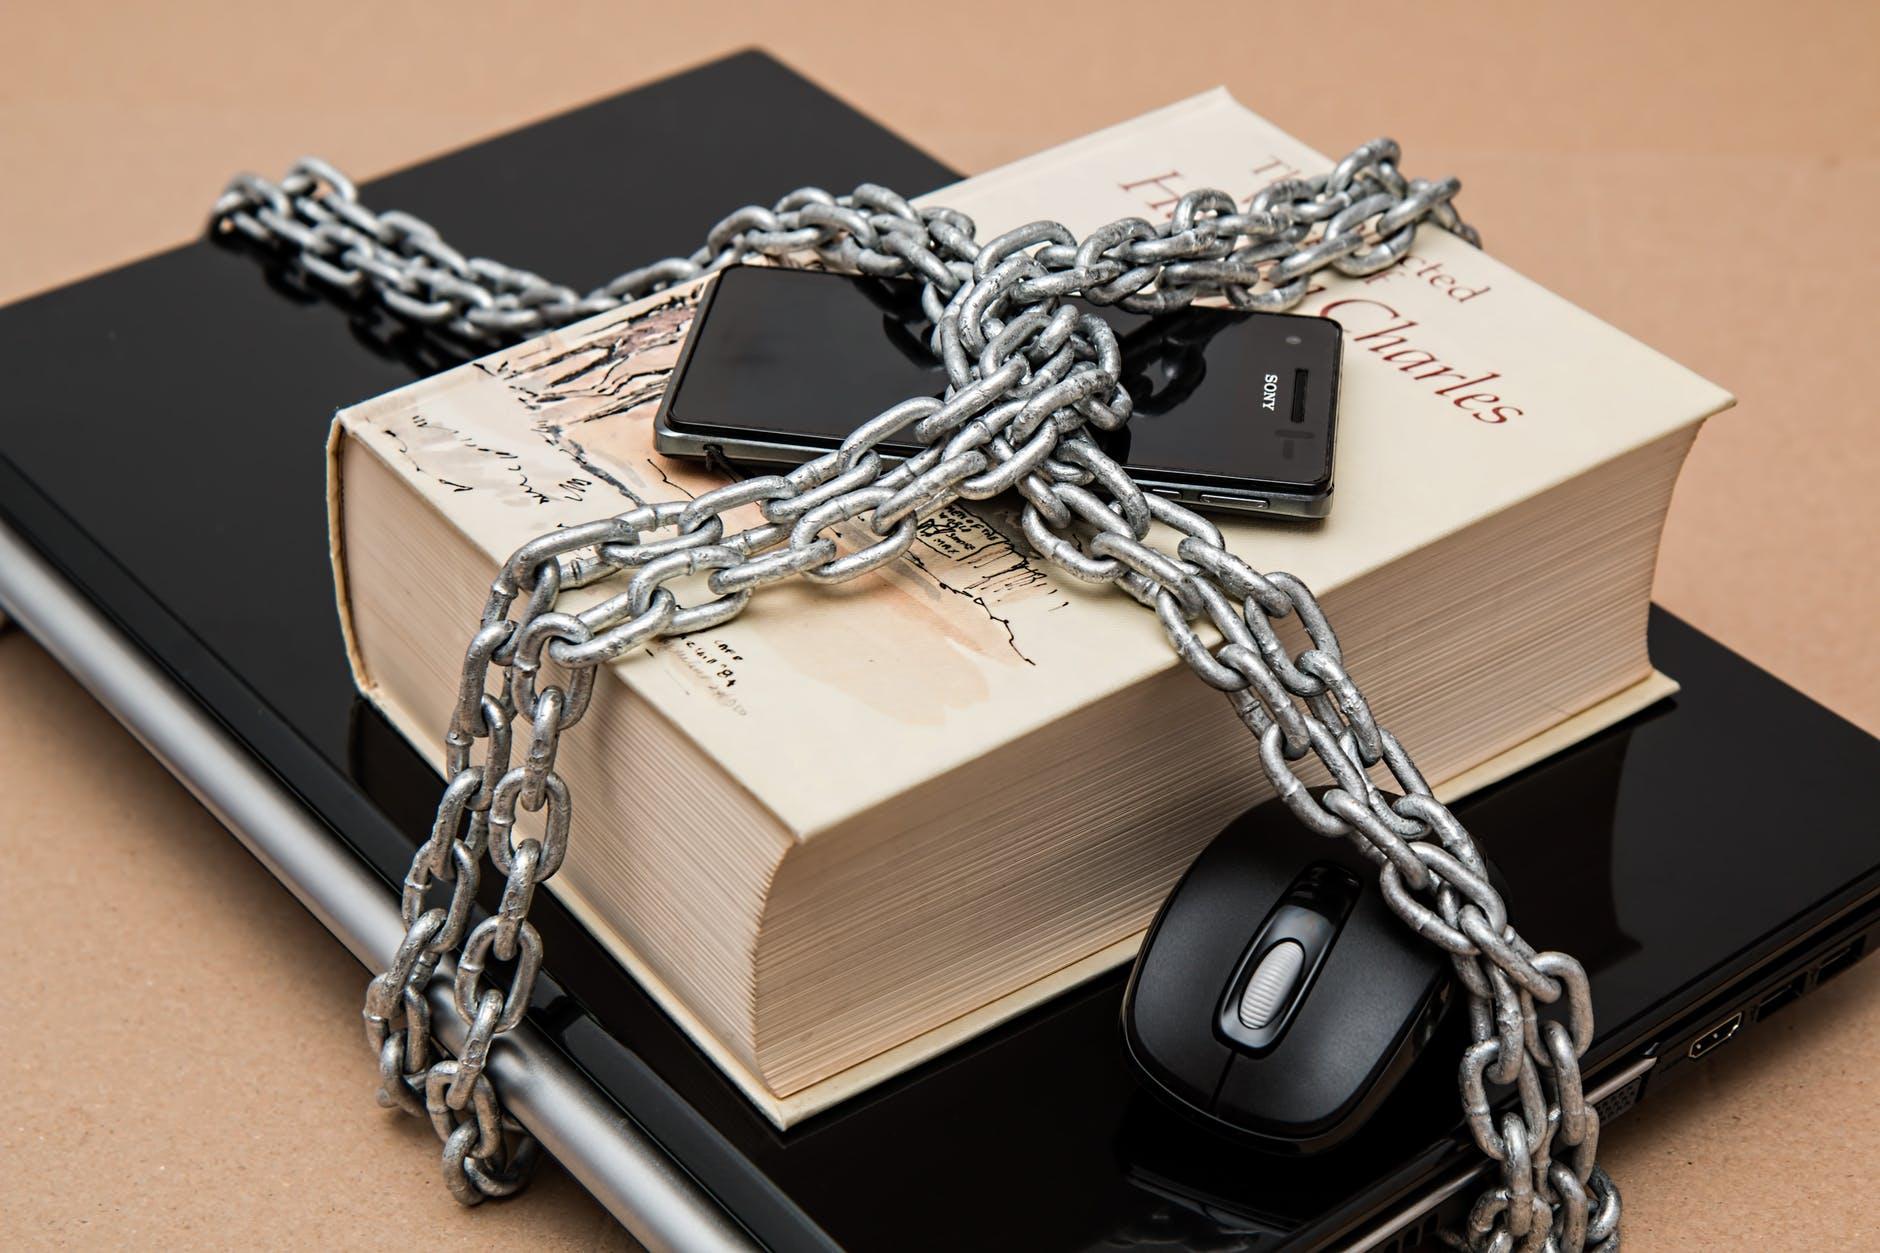 Öt fajta kriptotárca Binance Smart Chainre